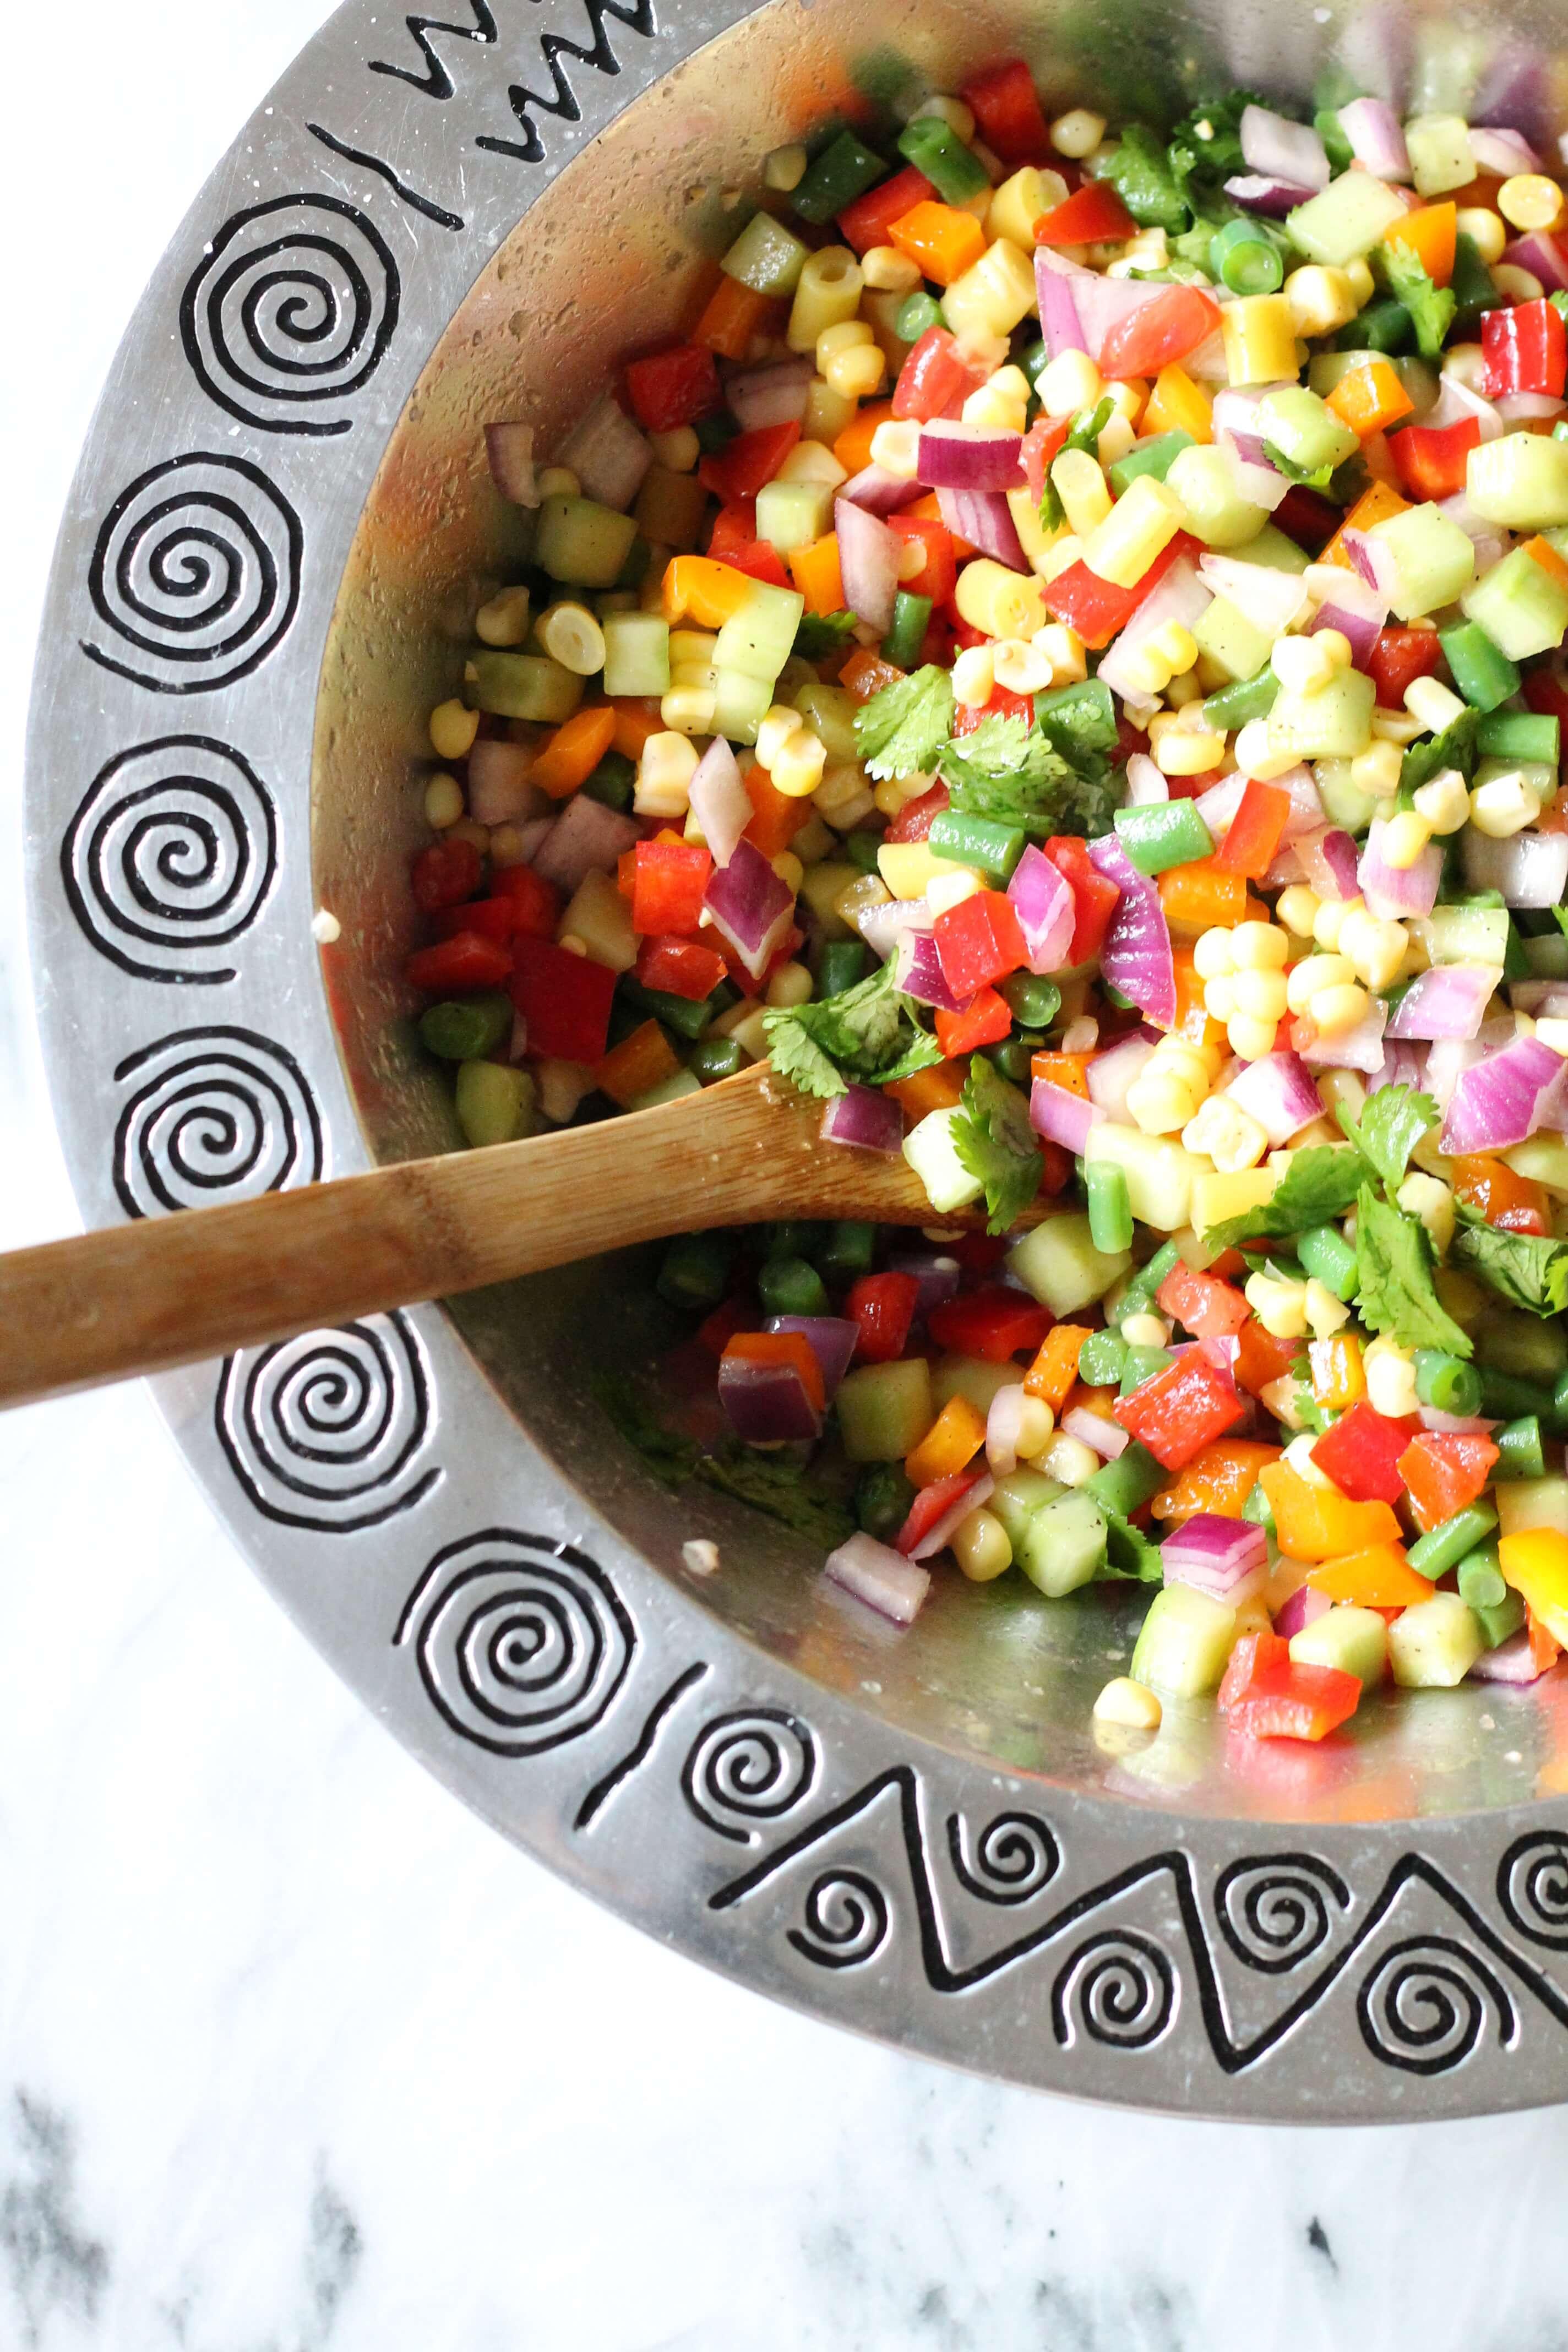 martha stewarts chopped vegetable salad the best mix of fresh veggies - Christmas Salads Martha Stewart